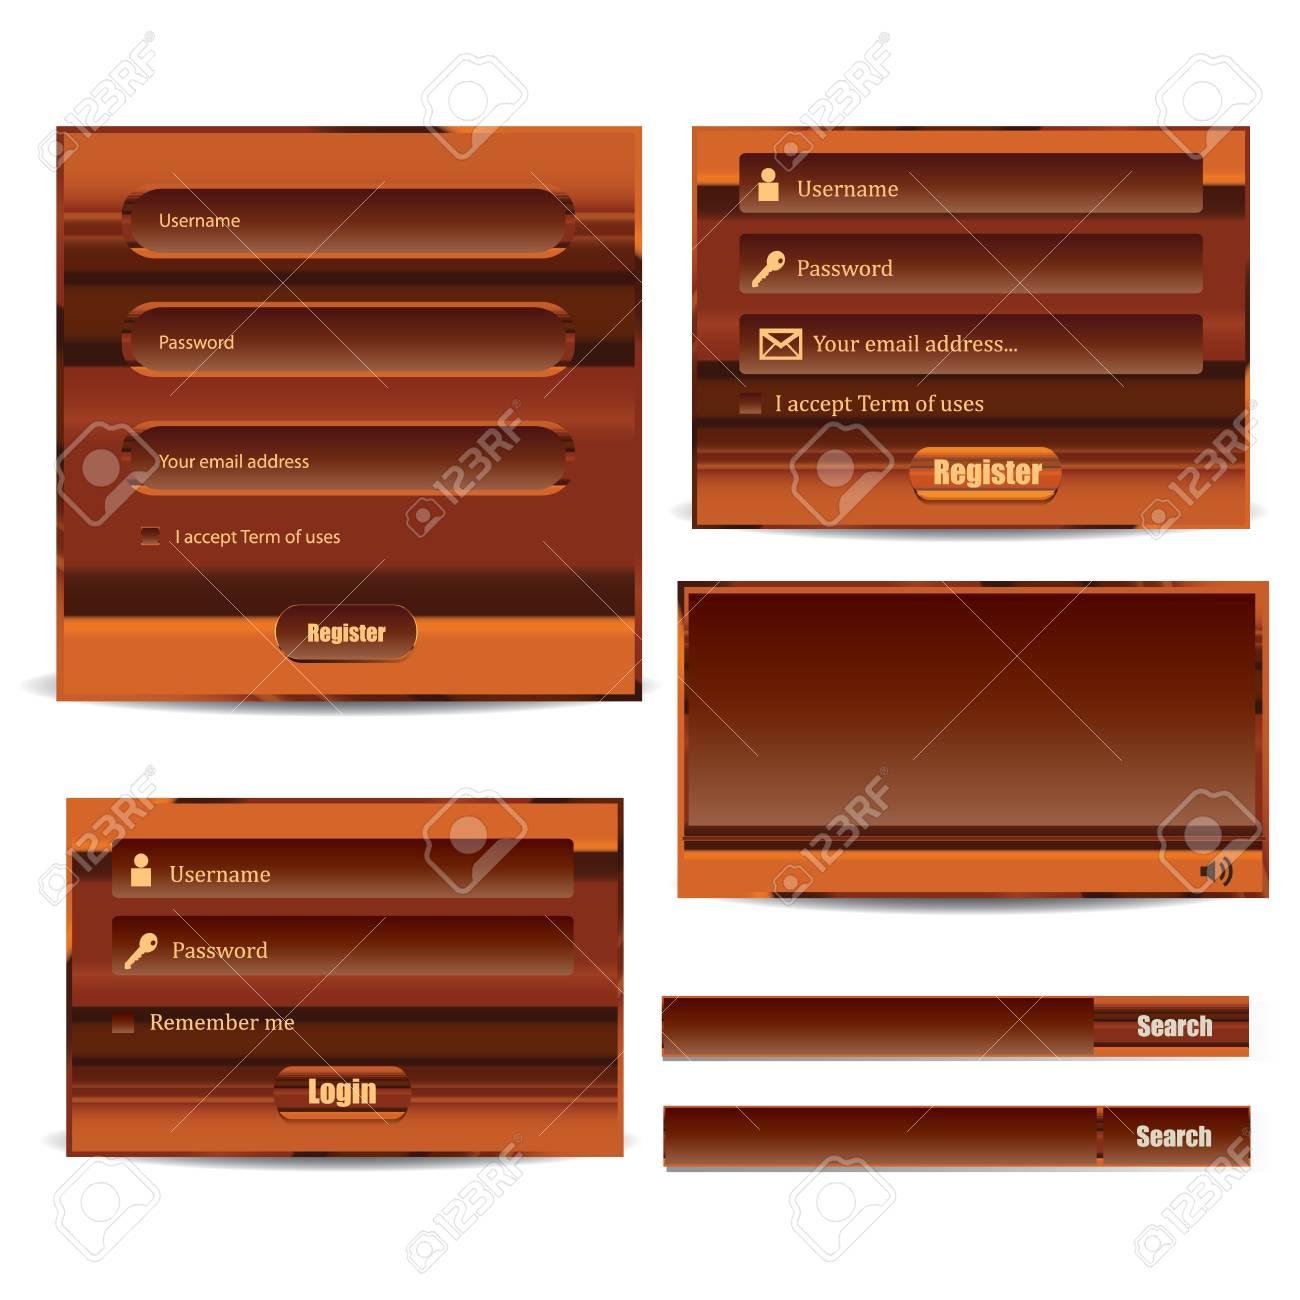 Web UI Elements Stock Vector - 18513718